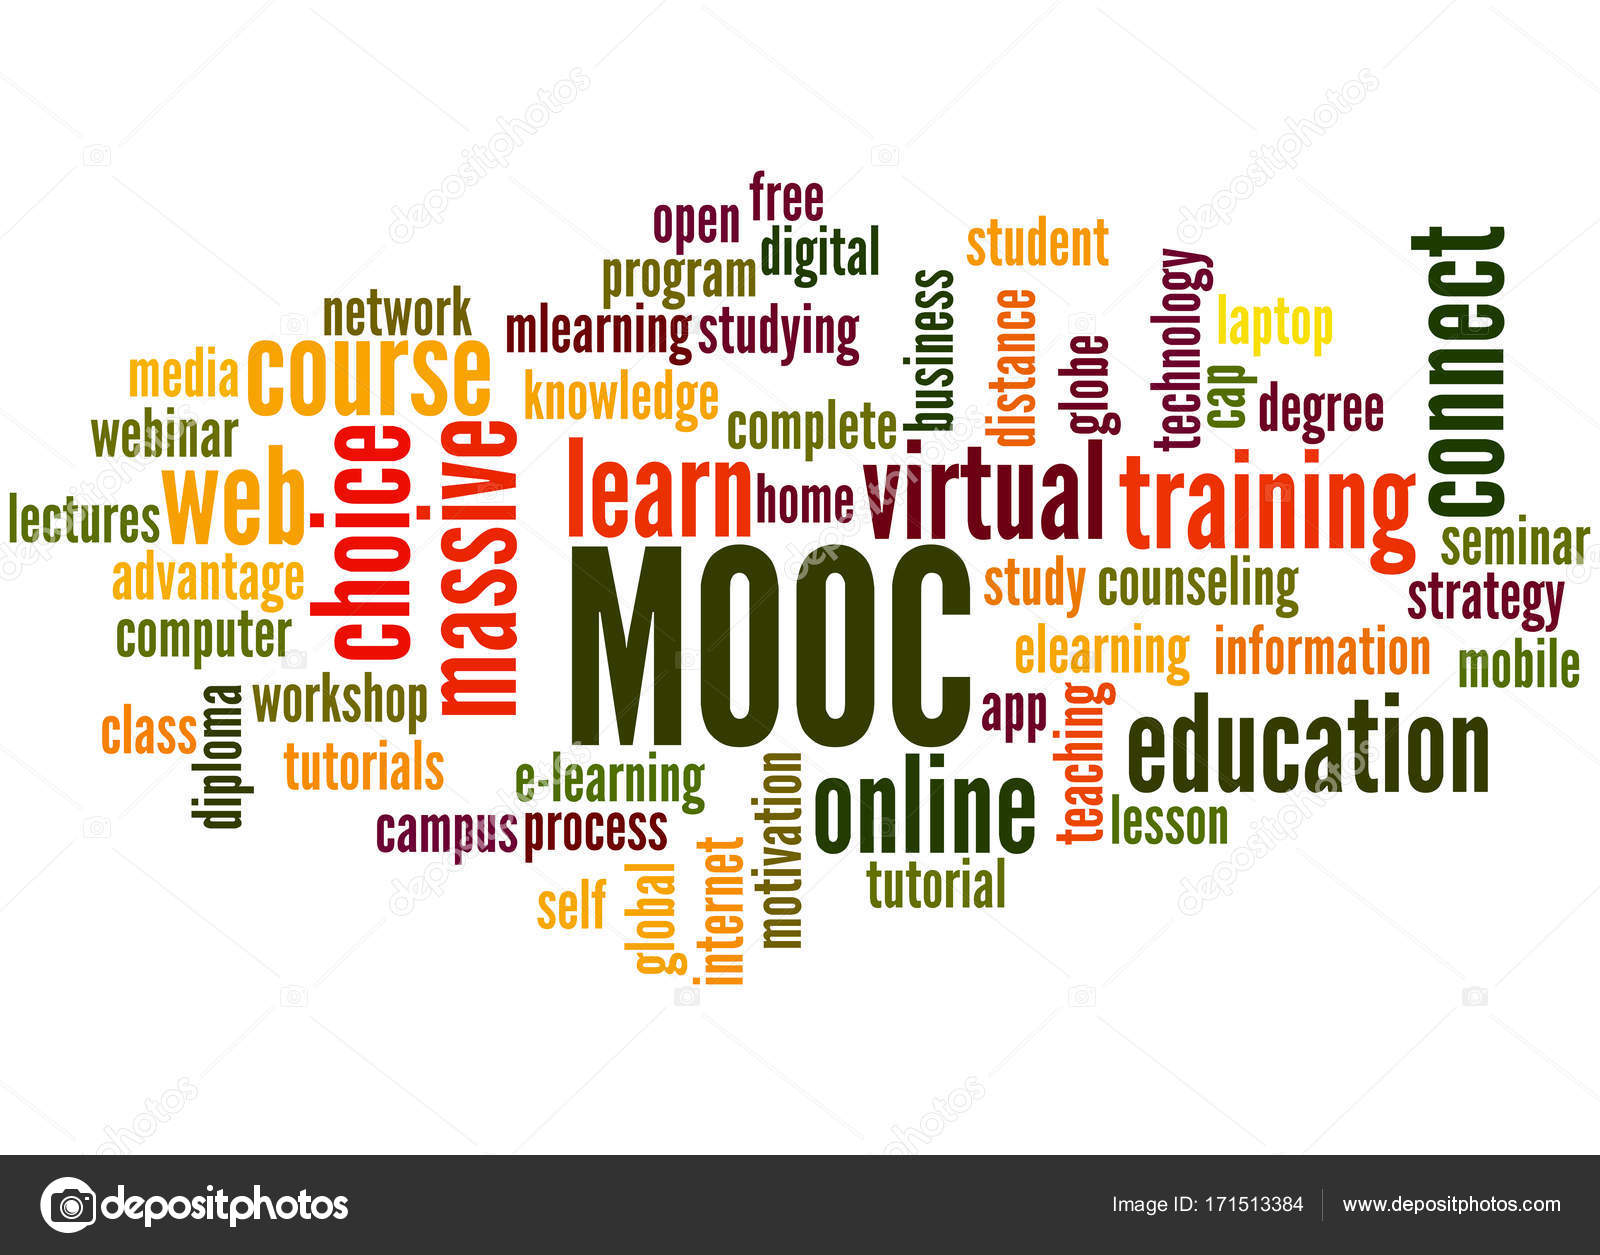 MOOC - massive open online course, word cloud concept 2 — Stock Photo